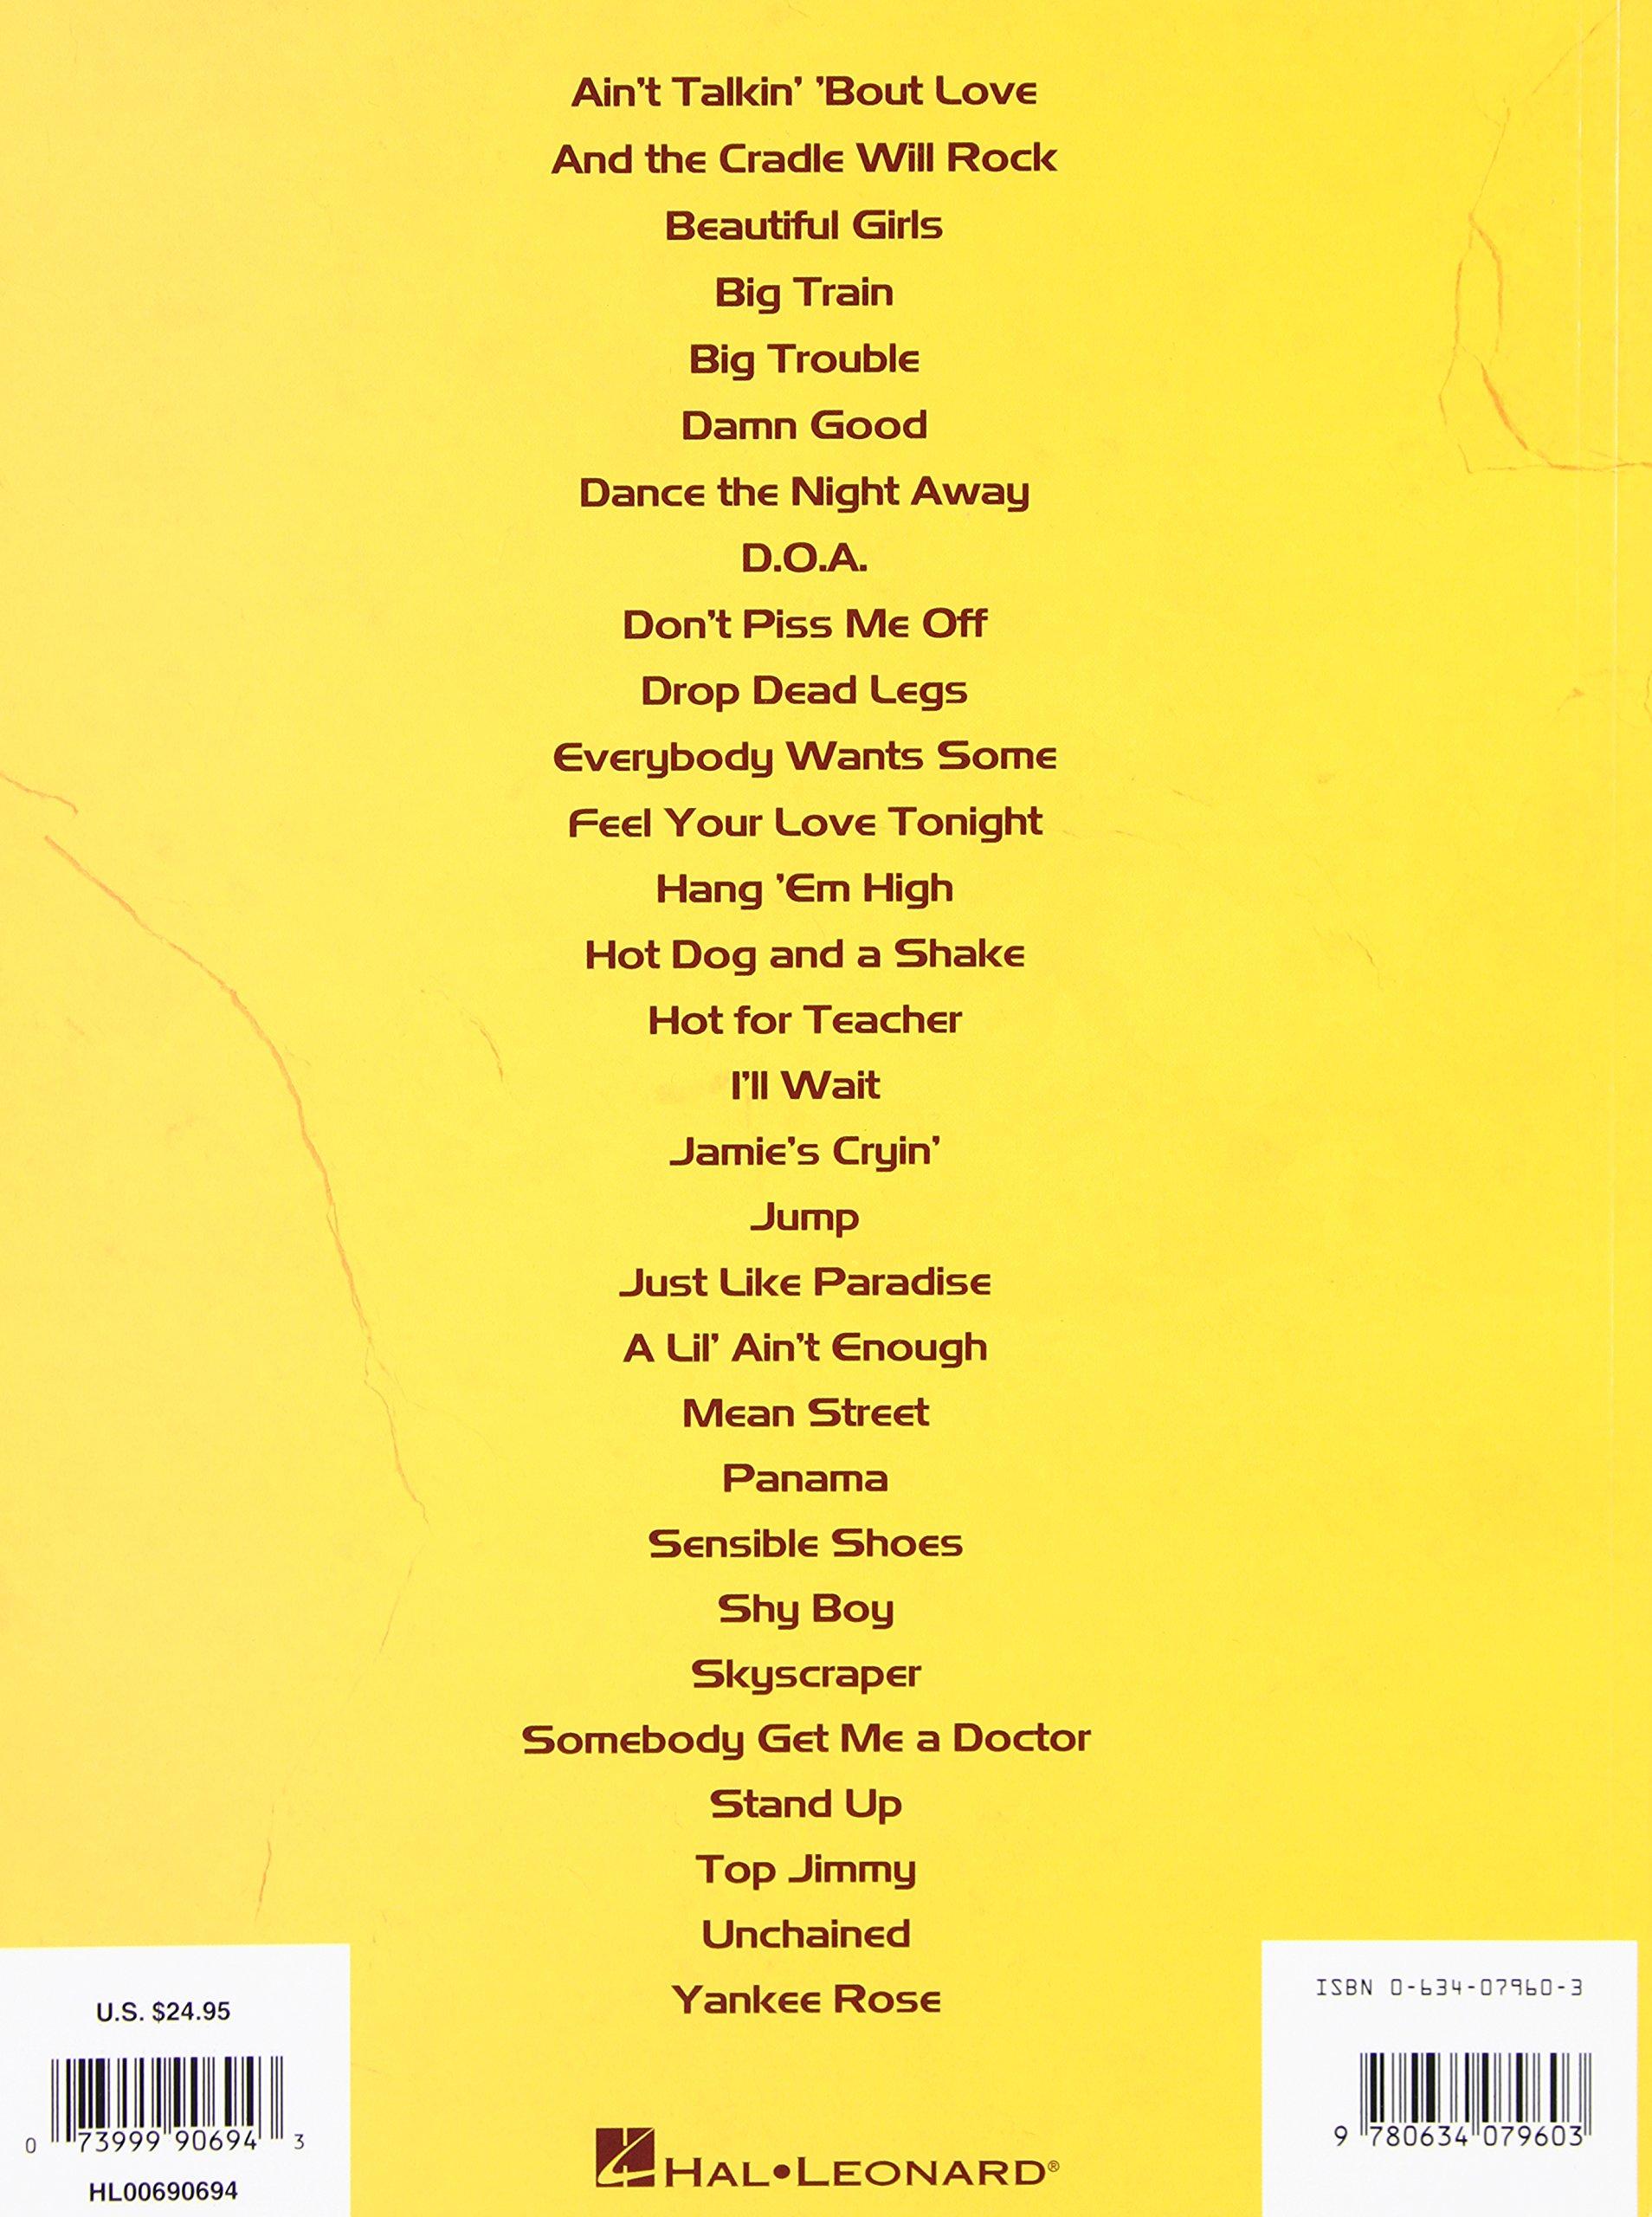 Related Sheet Music